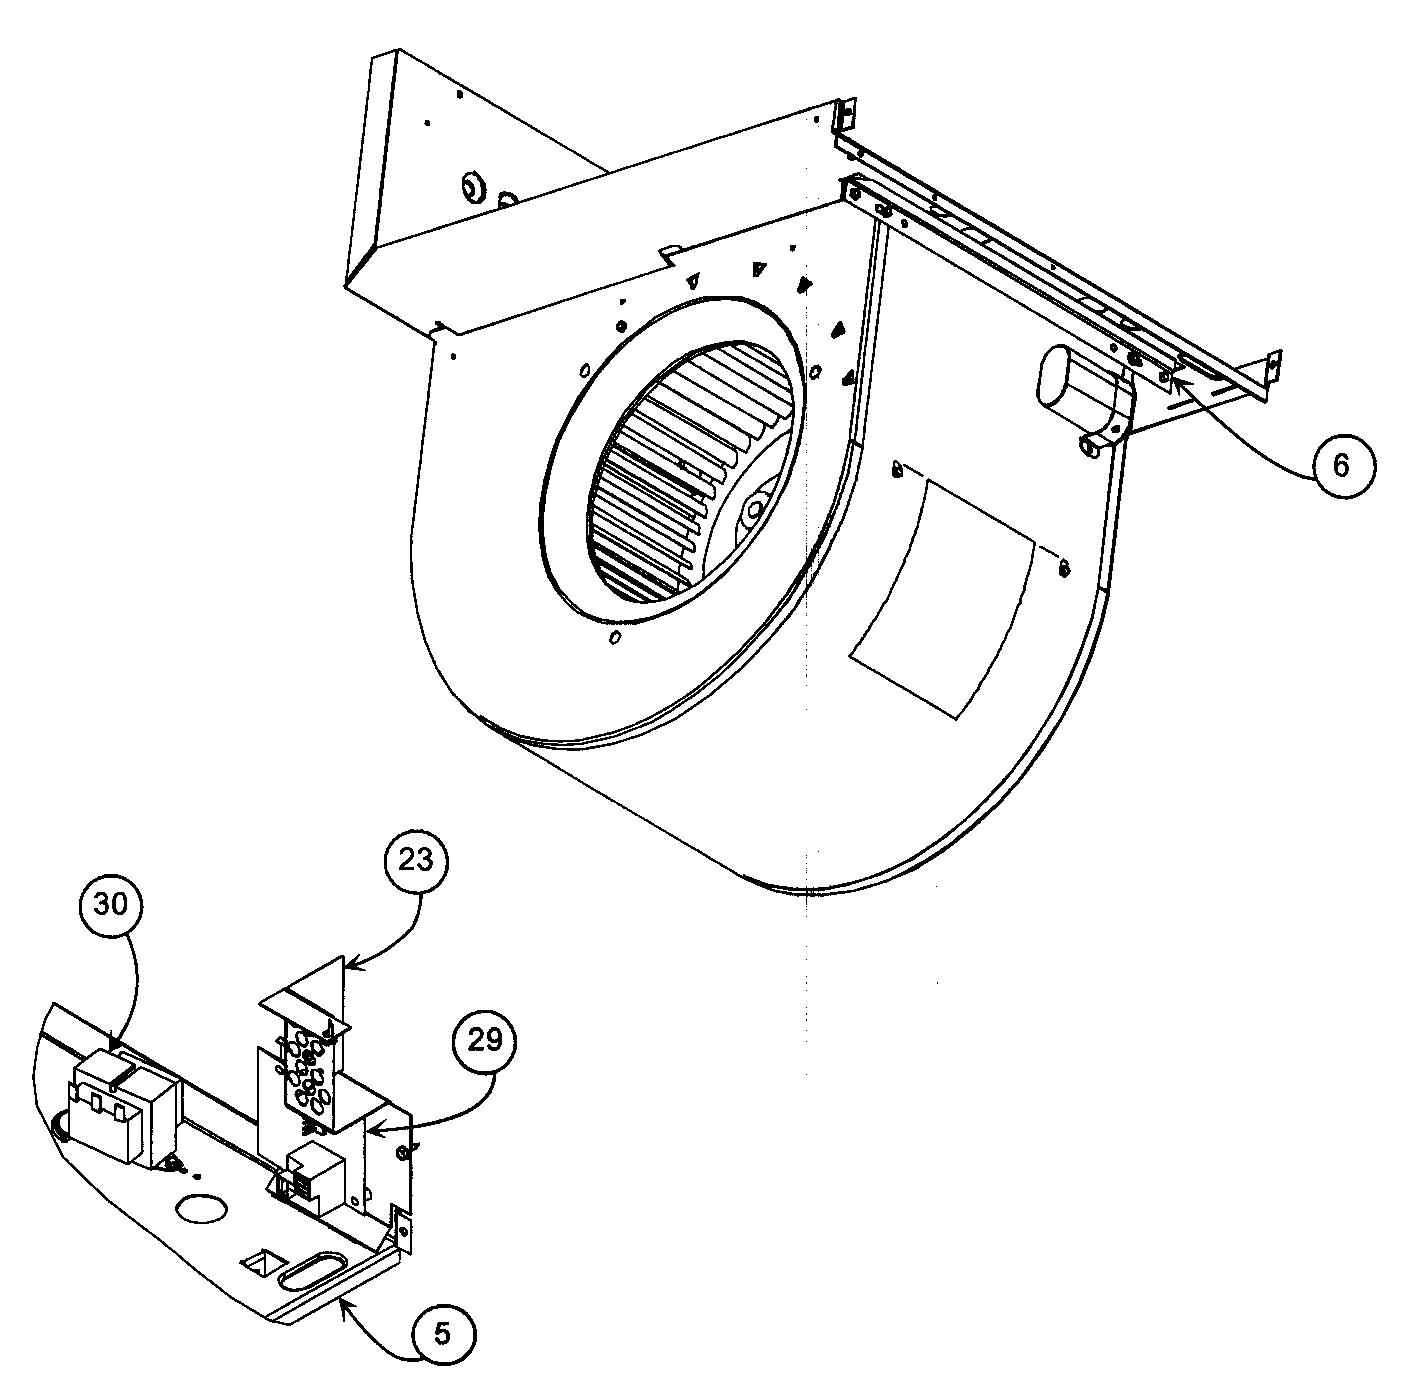 Payne model PF1MNC025000 air handler (indoor blower&evap